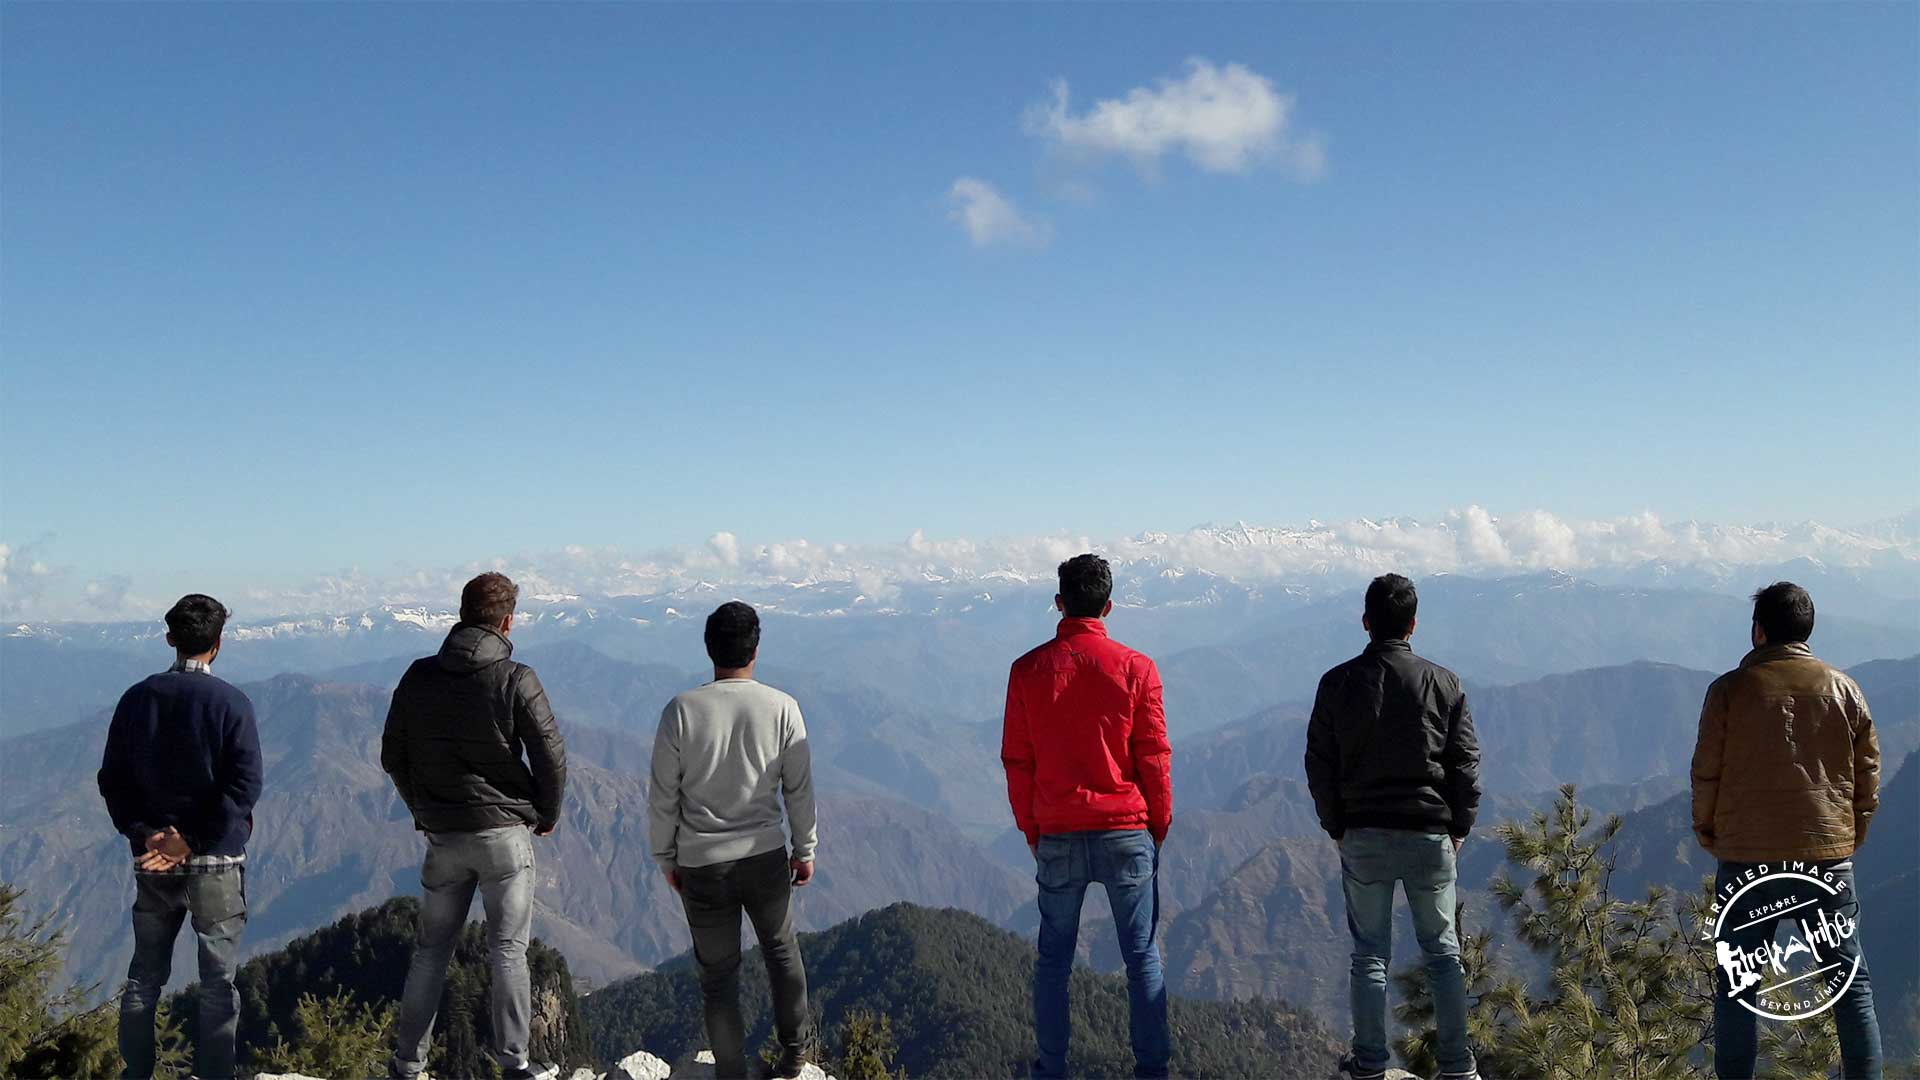 Shali Tibba Trek - View of Shrikhand Range